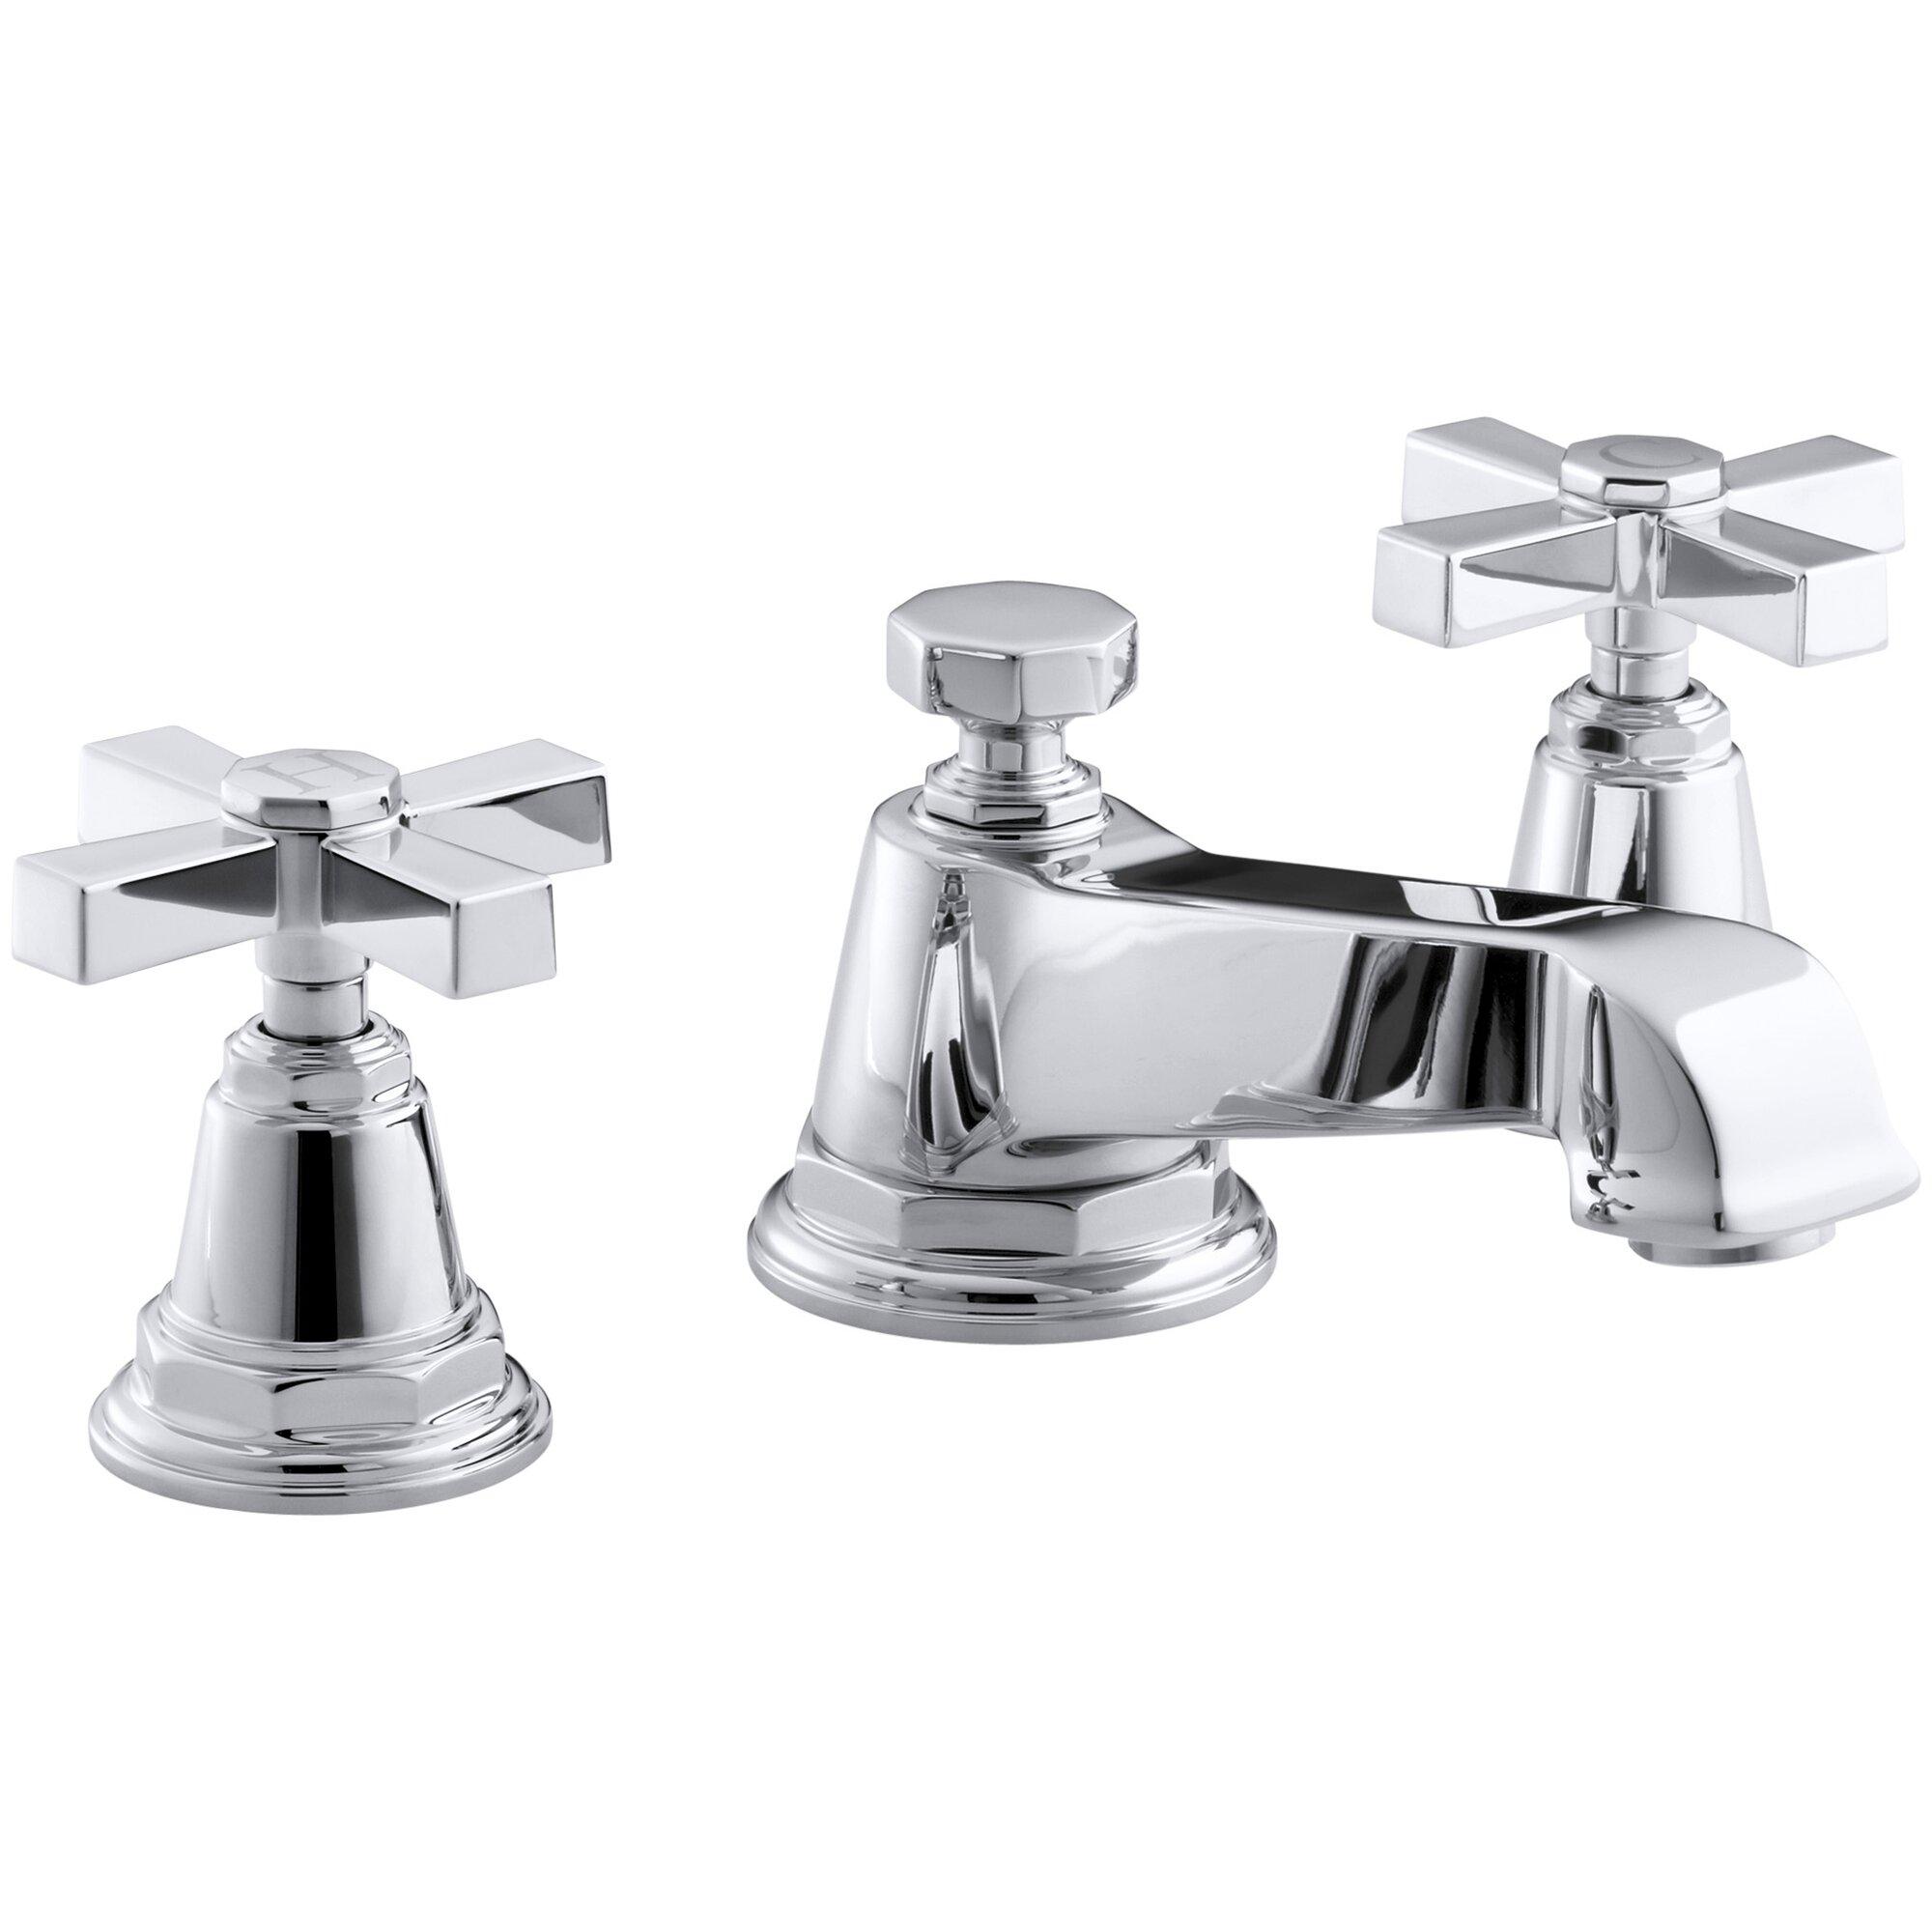 Cross Handle Bathroom Faucet Kohler Pinstripe Pure Widespread Bathroom Sink Faucet With Cross